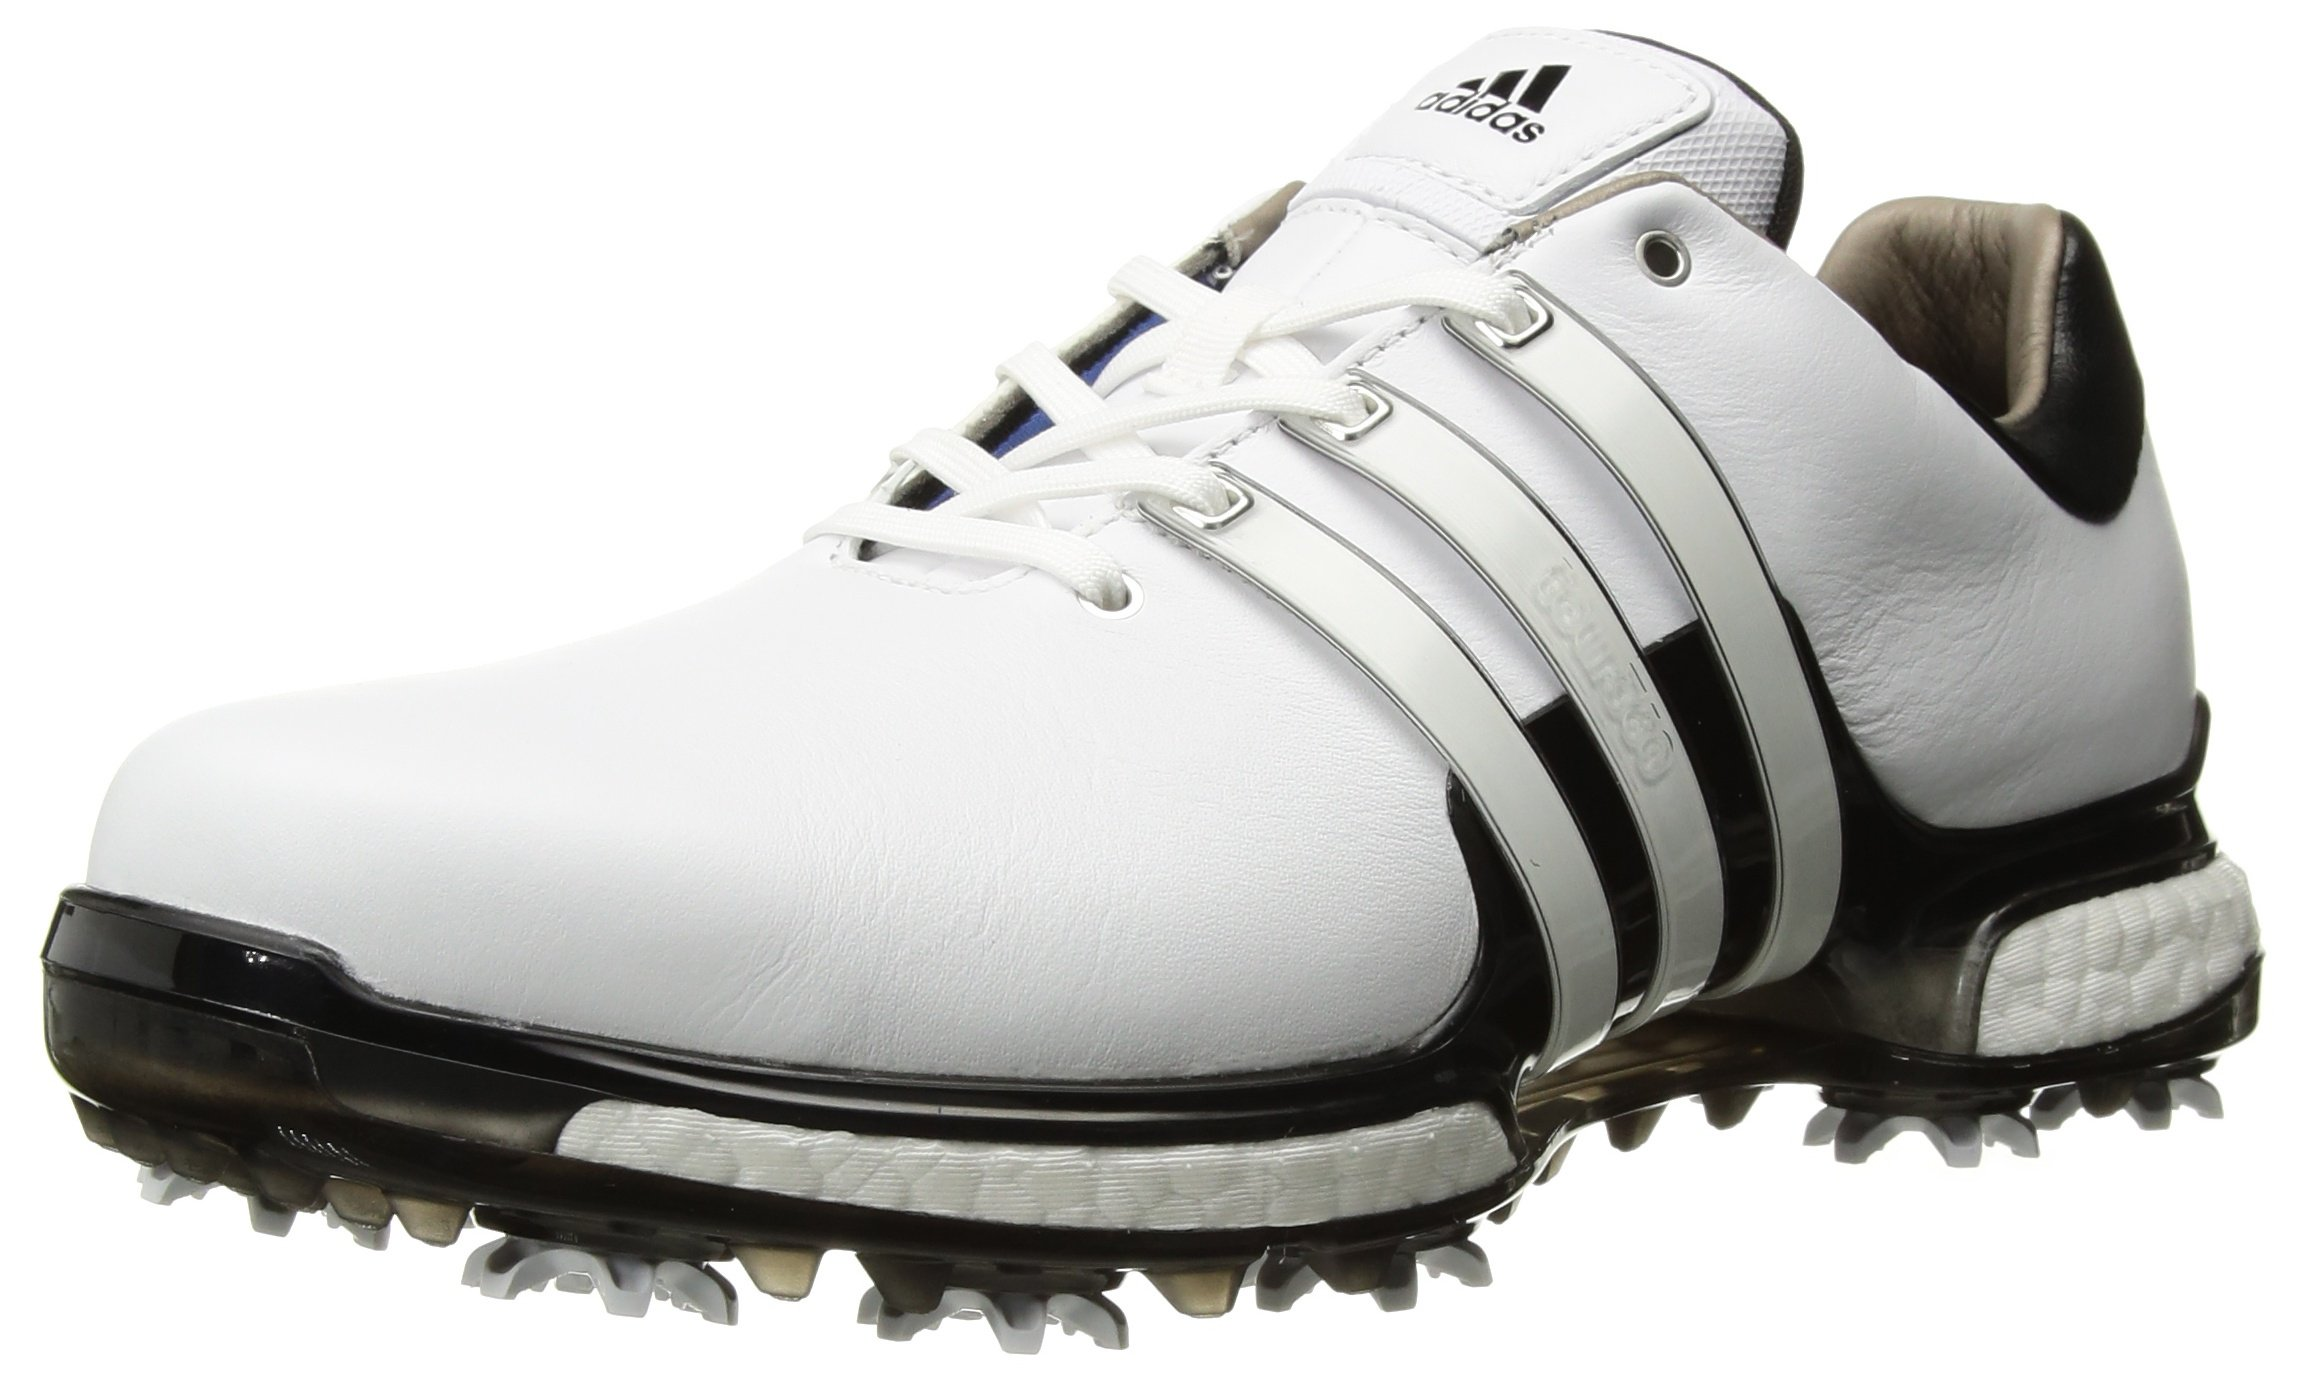 adidas Men's TOUR 360 2.0 Golf Shoe, White/Black, 7 M US